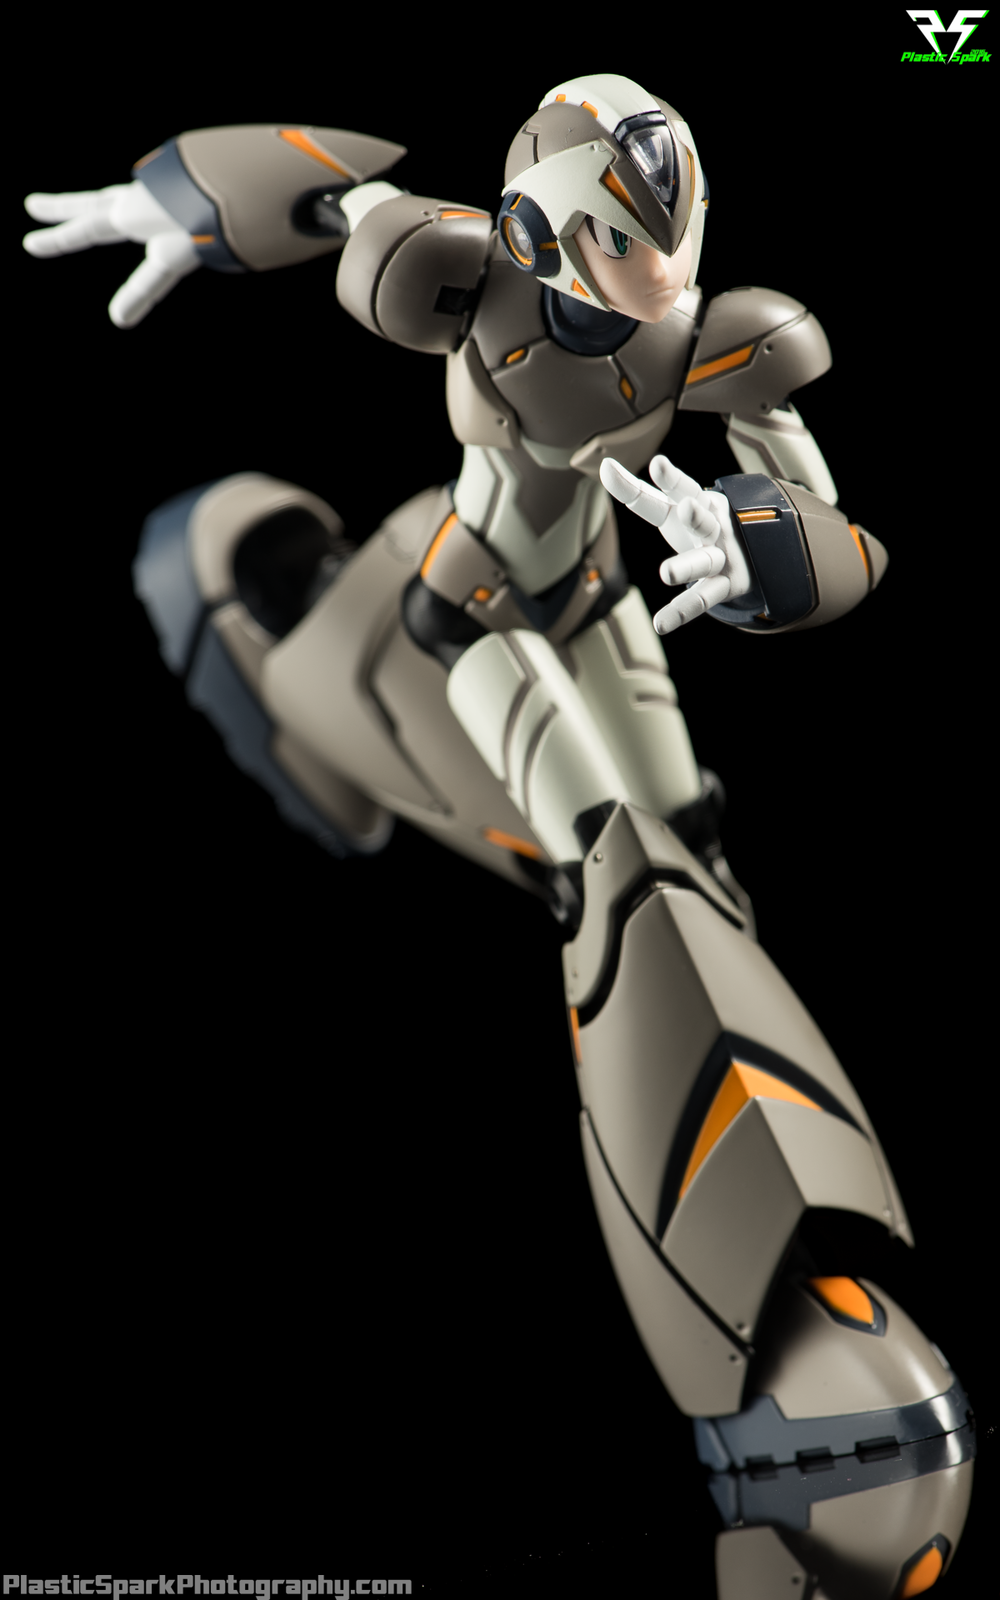 Truforce-Megaman-X-KS-Variant-(2-of-9).png